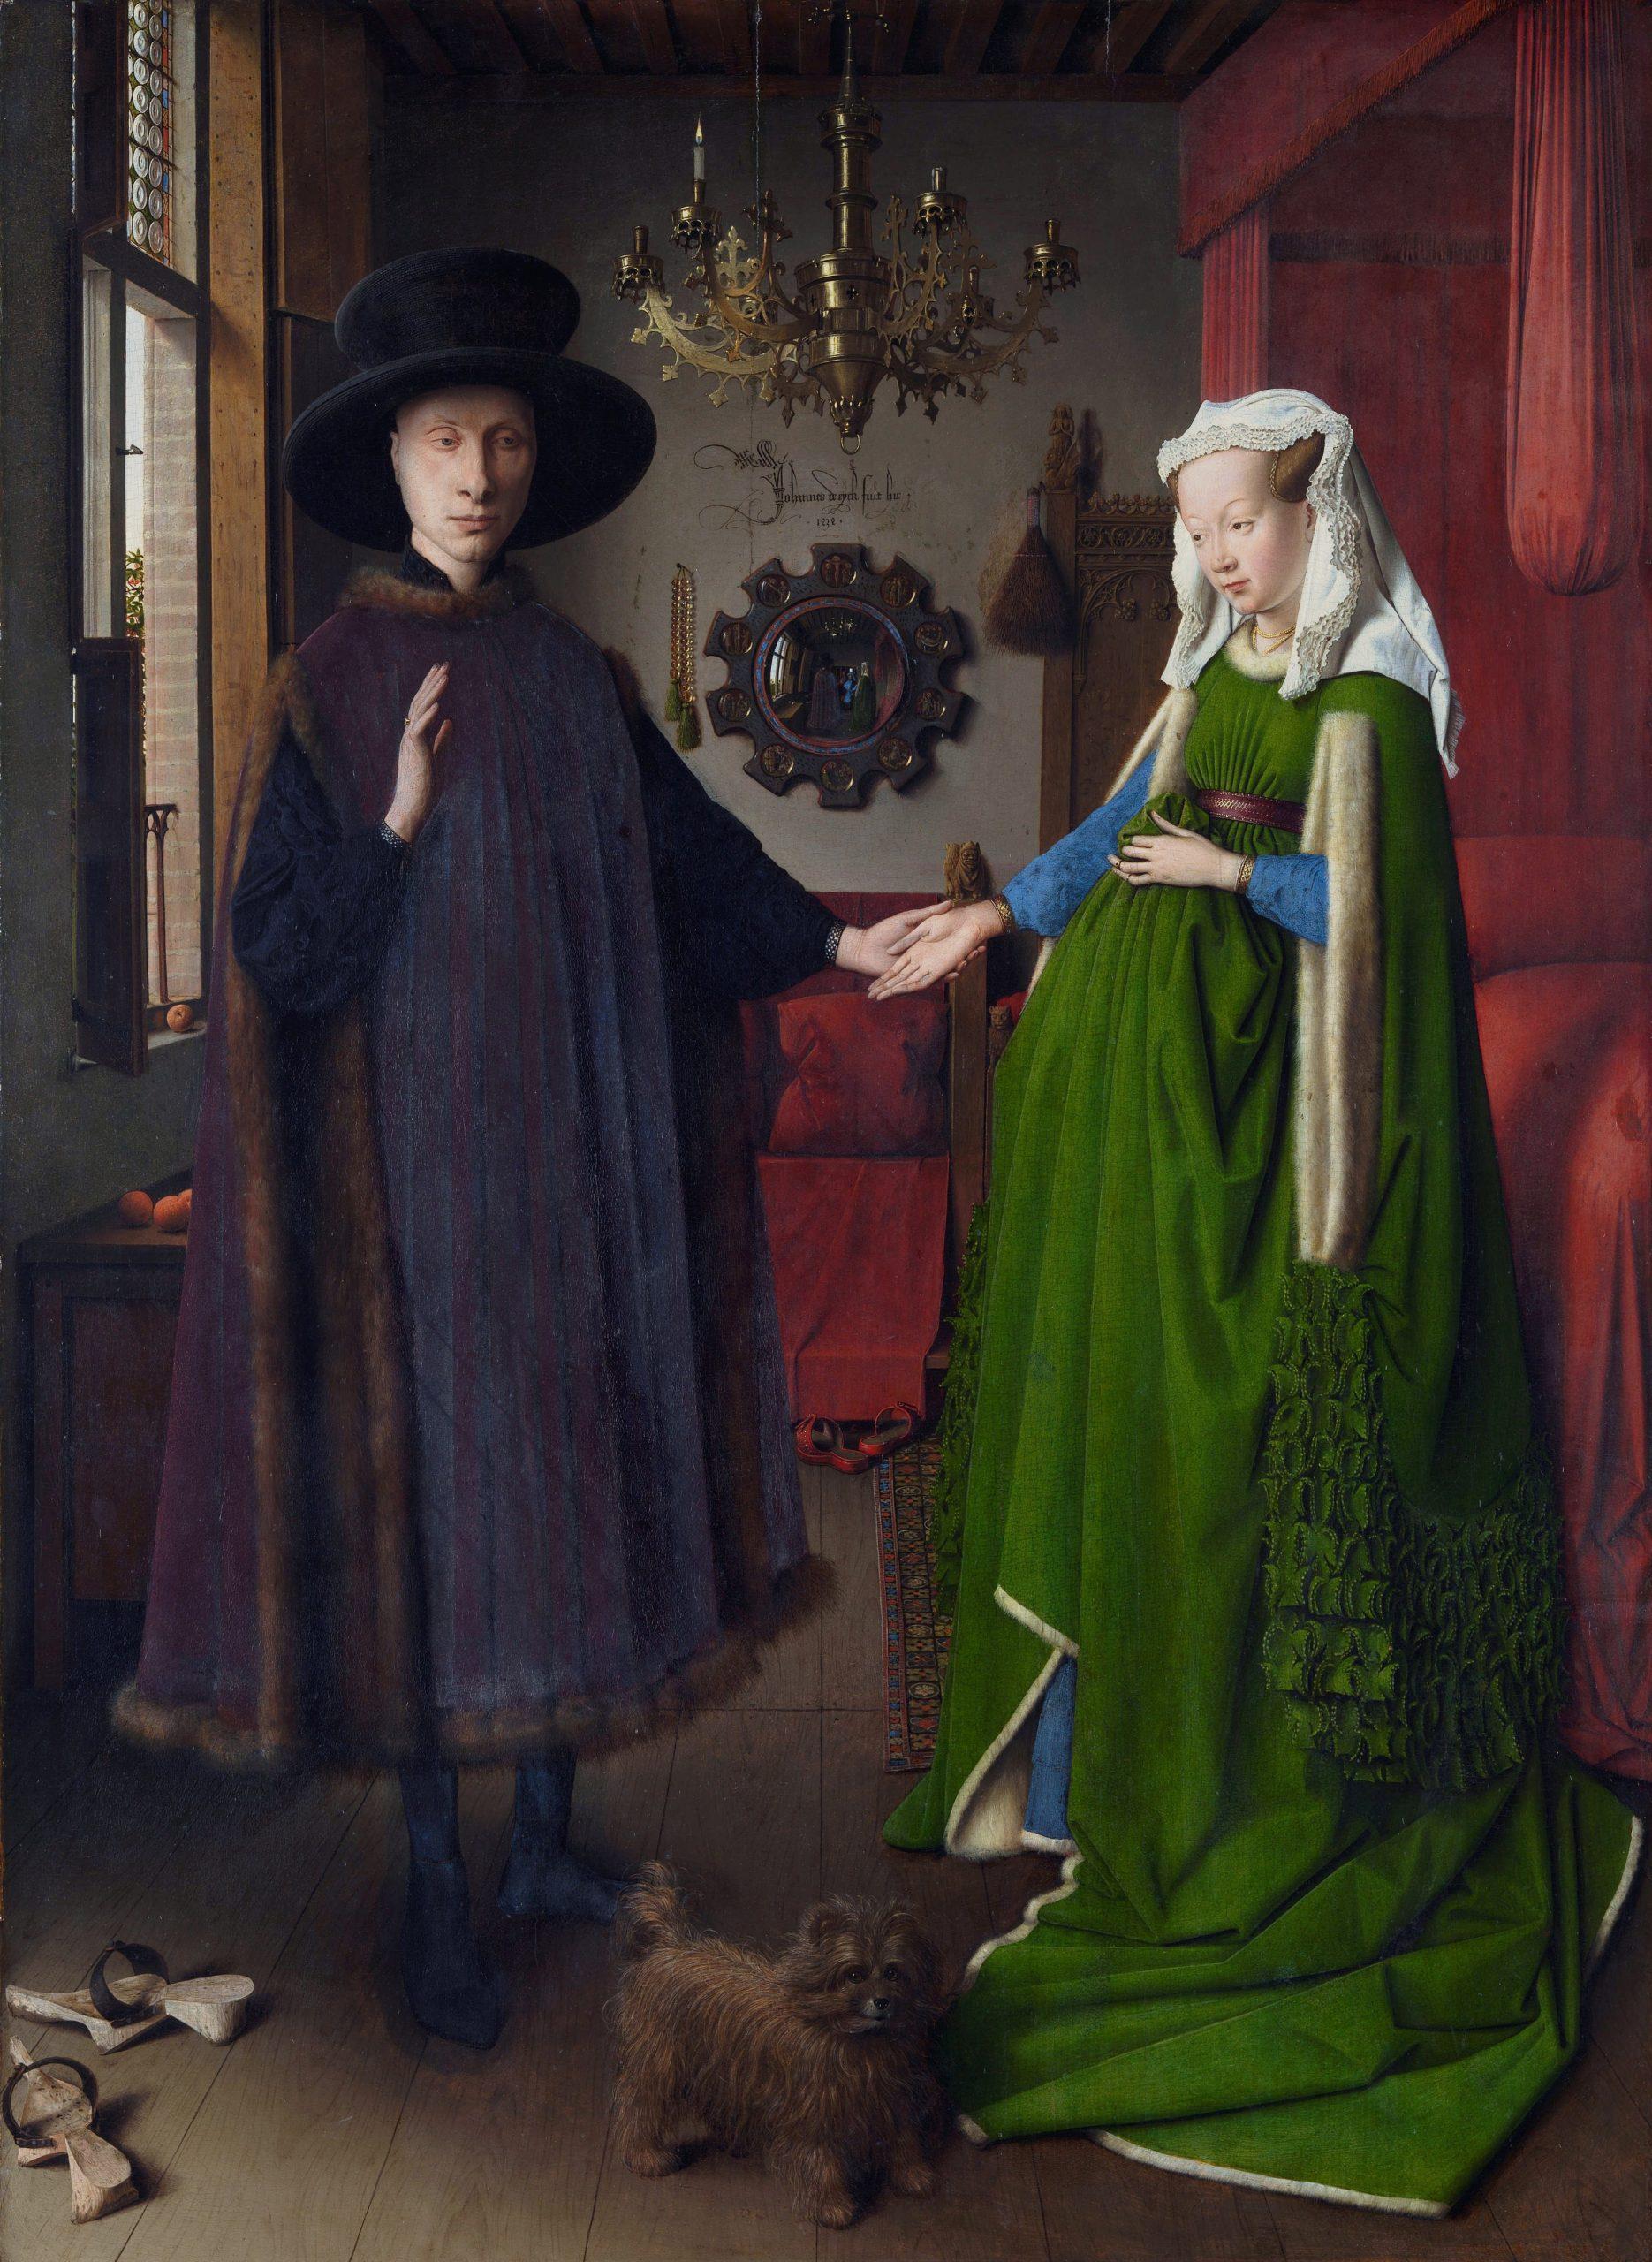 The Arnolfini Portrait Jan van Eyck National Gallery, London